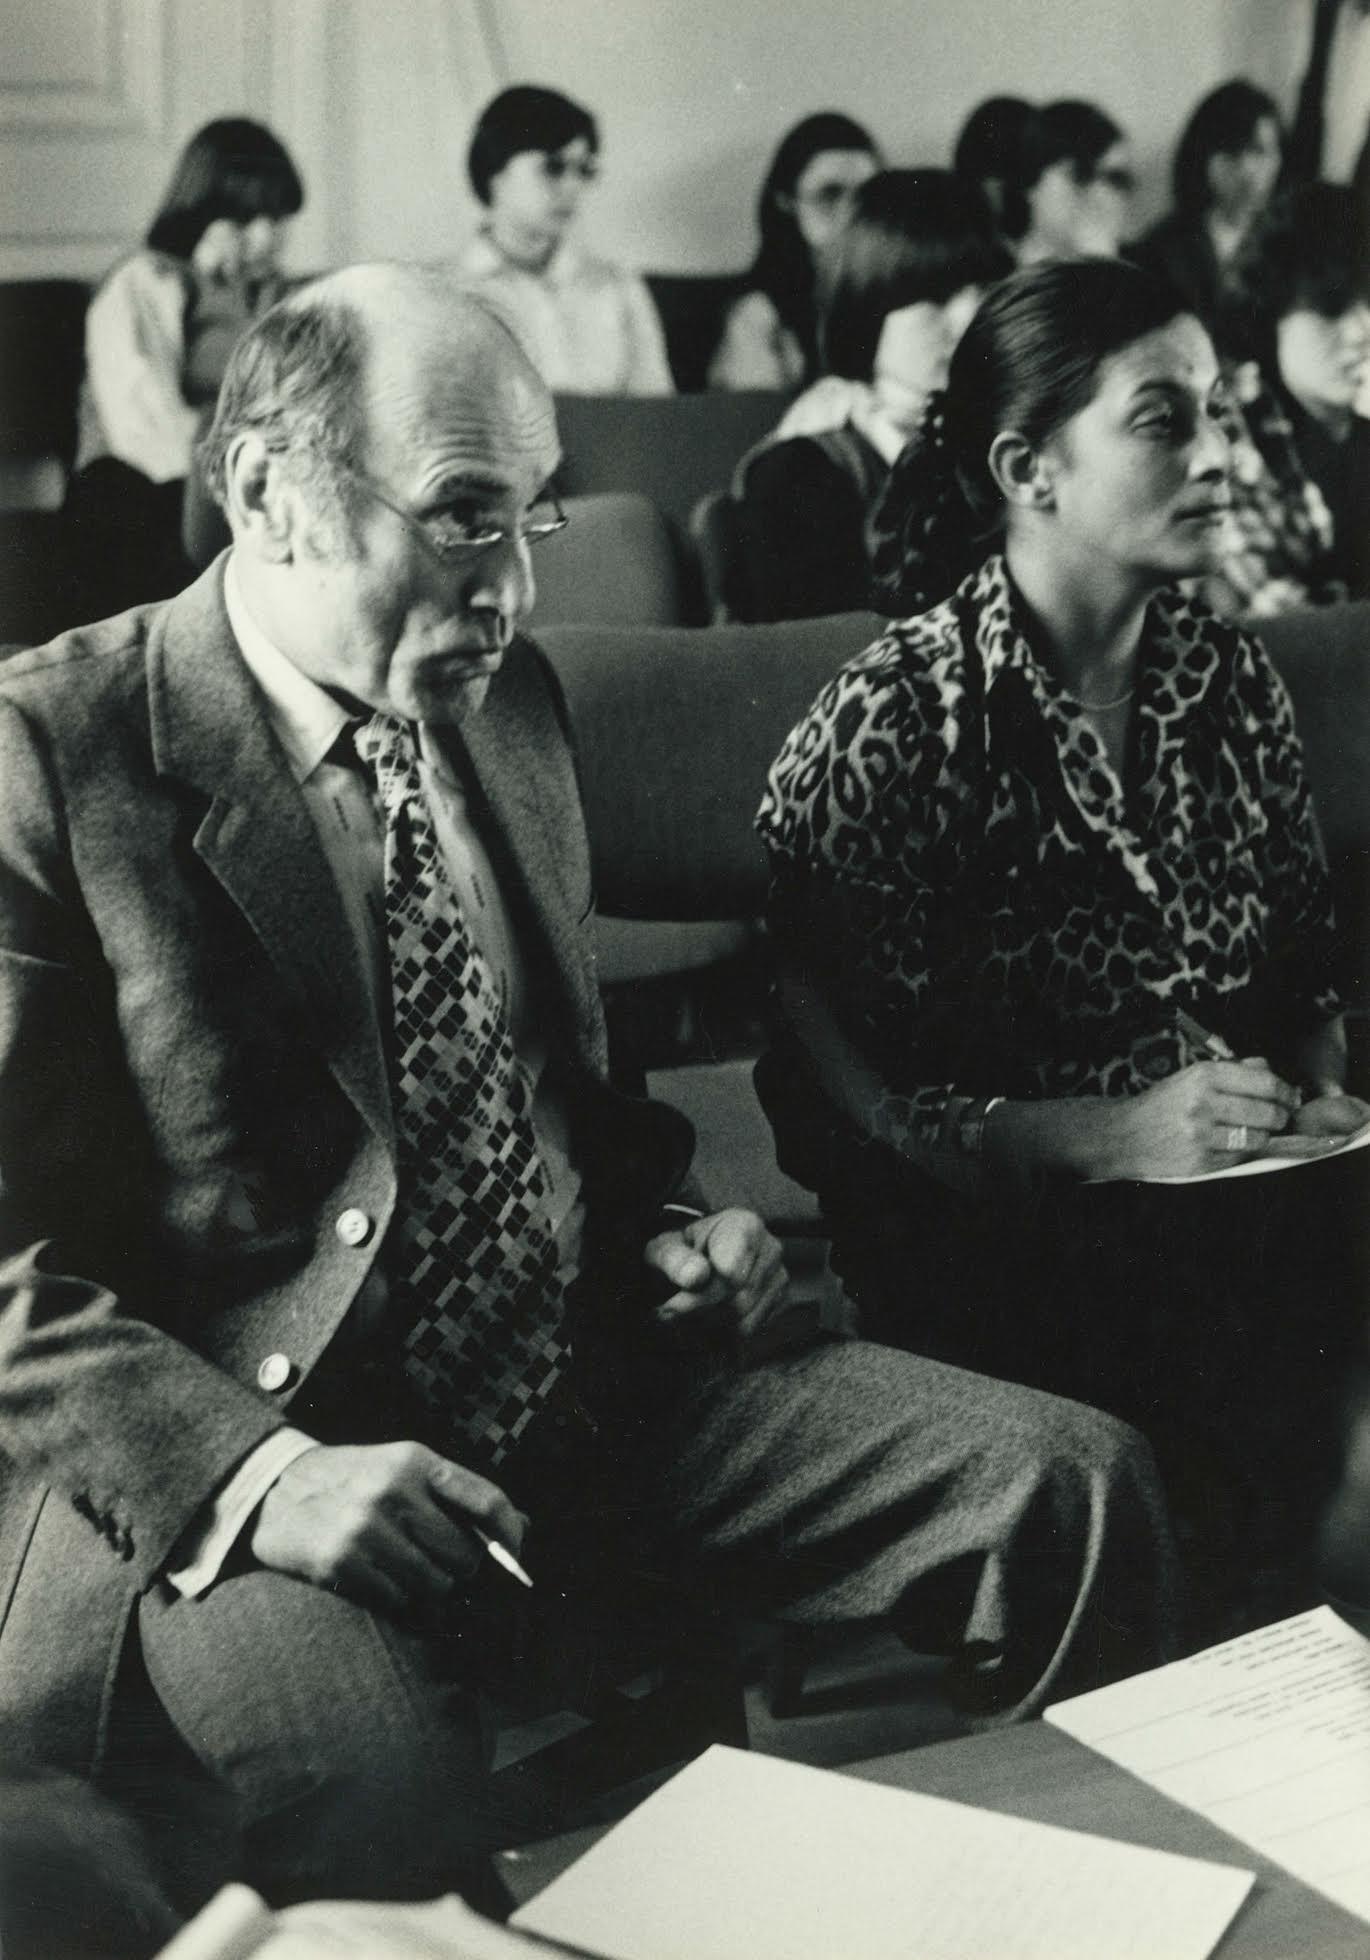 Bánffy Györggyel 1981-ben Fotó: Óbudai Társaskör